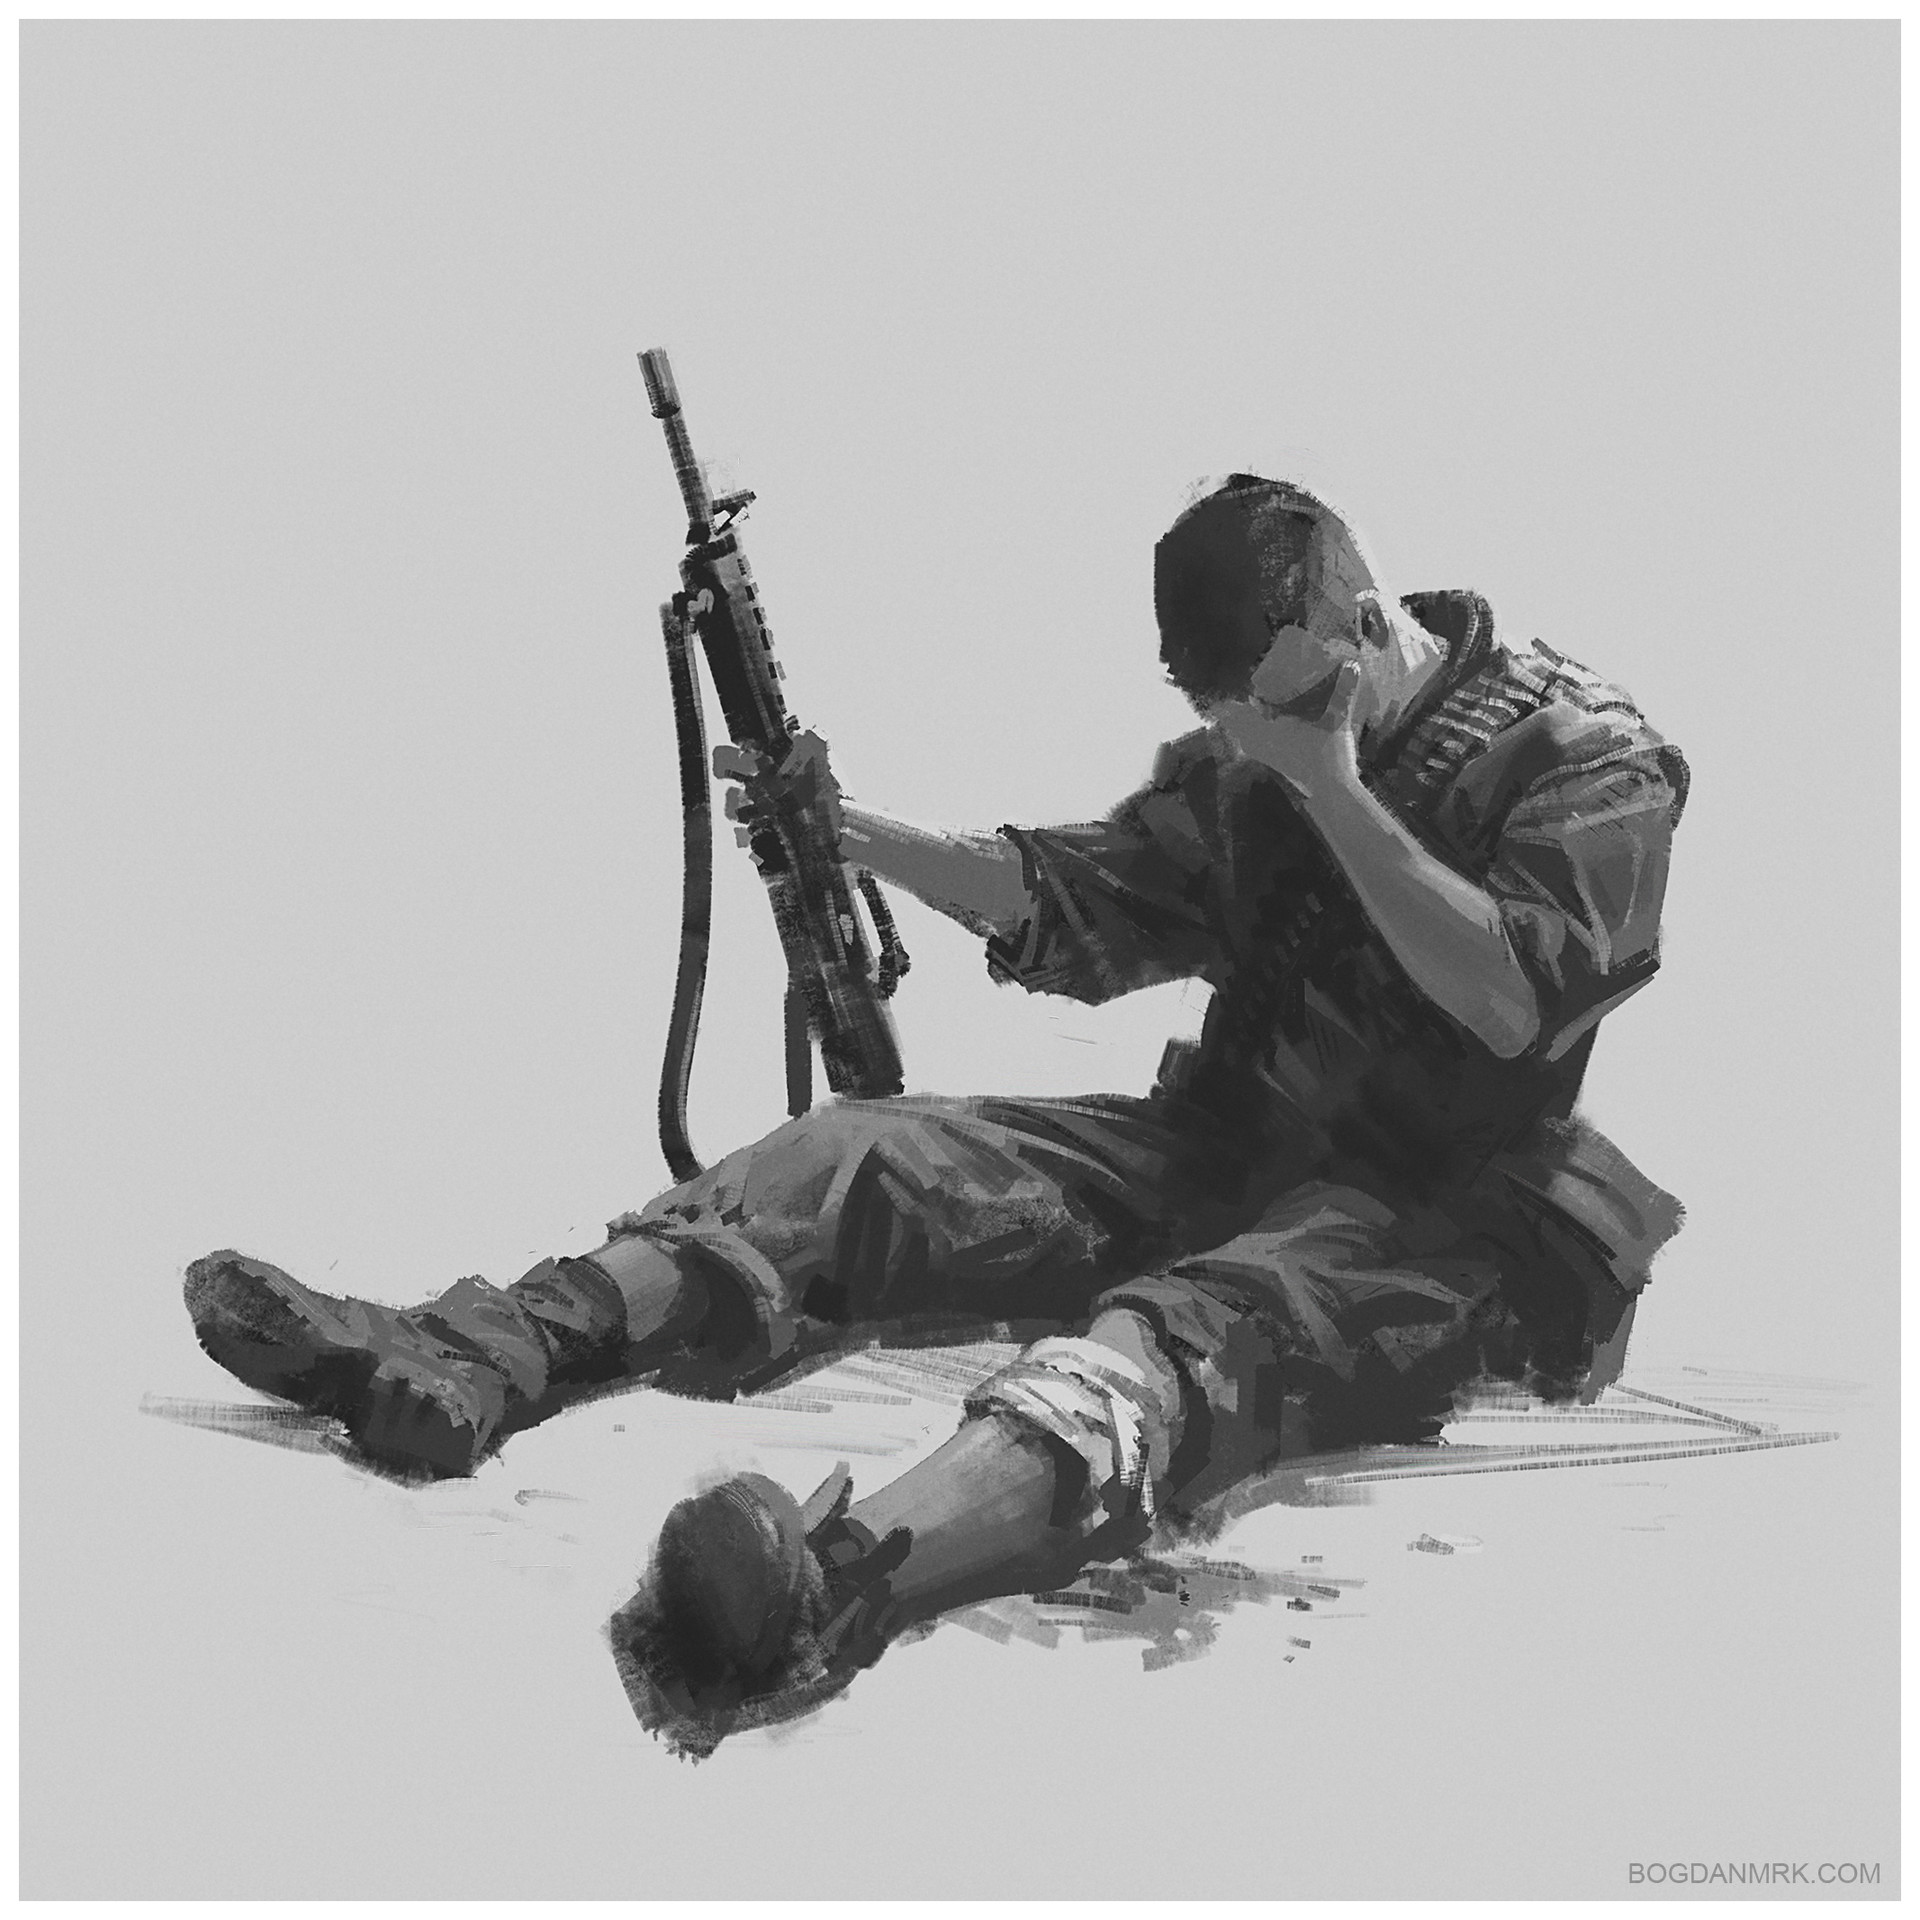 Bogdan marica bogdanmrk soldier sketch 01